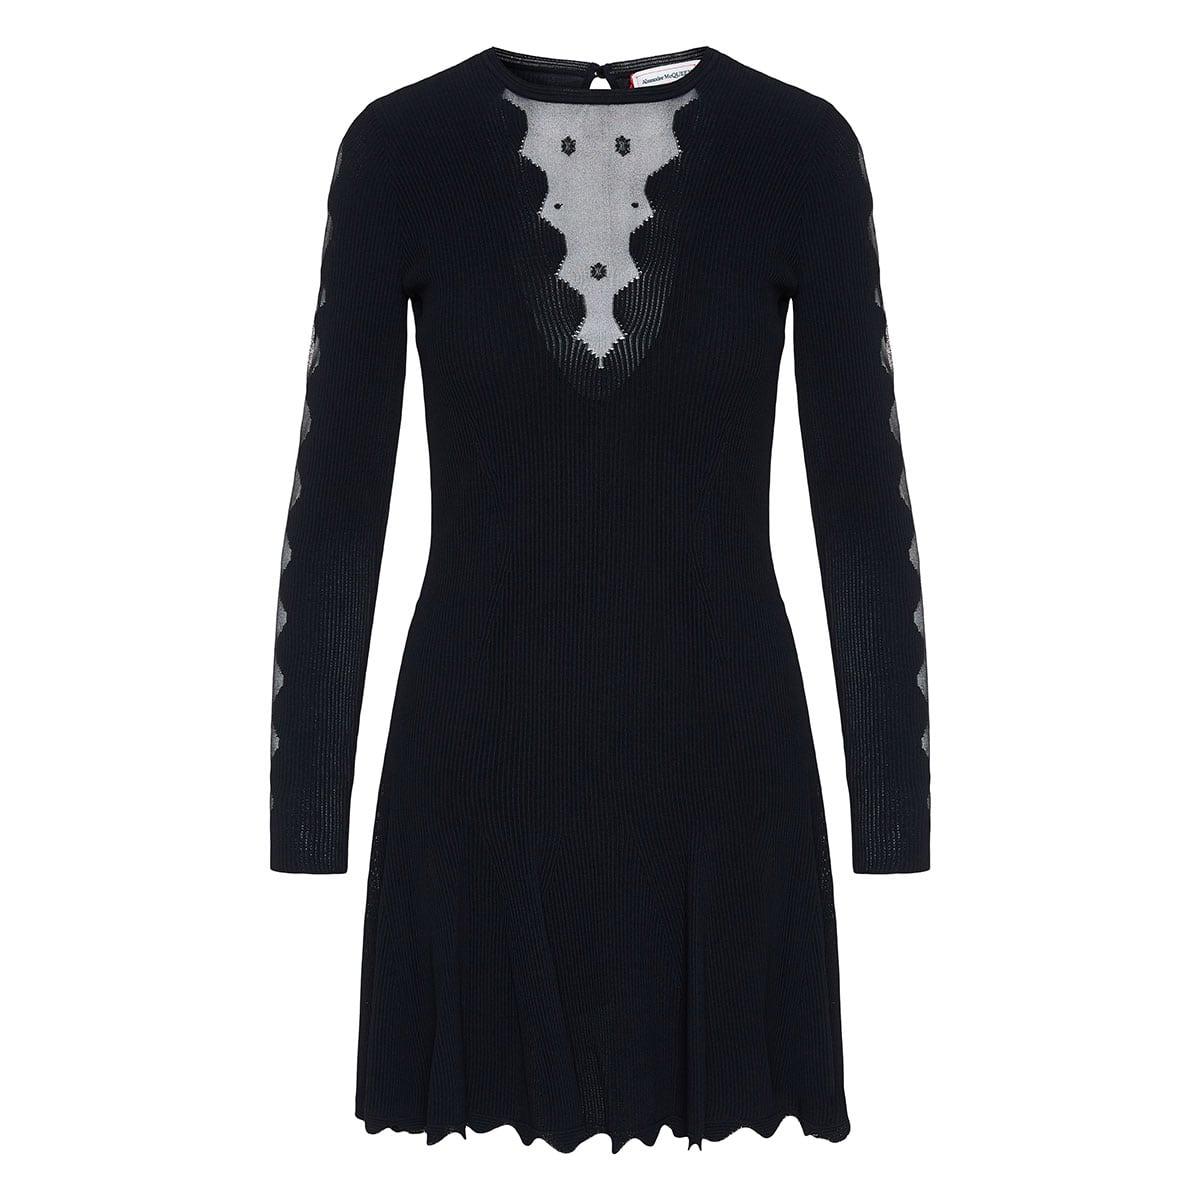 Sheer-paneled knitted mini dress